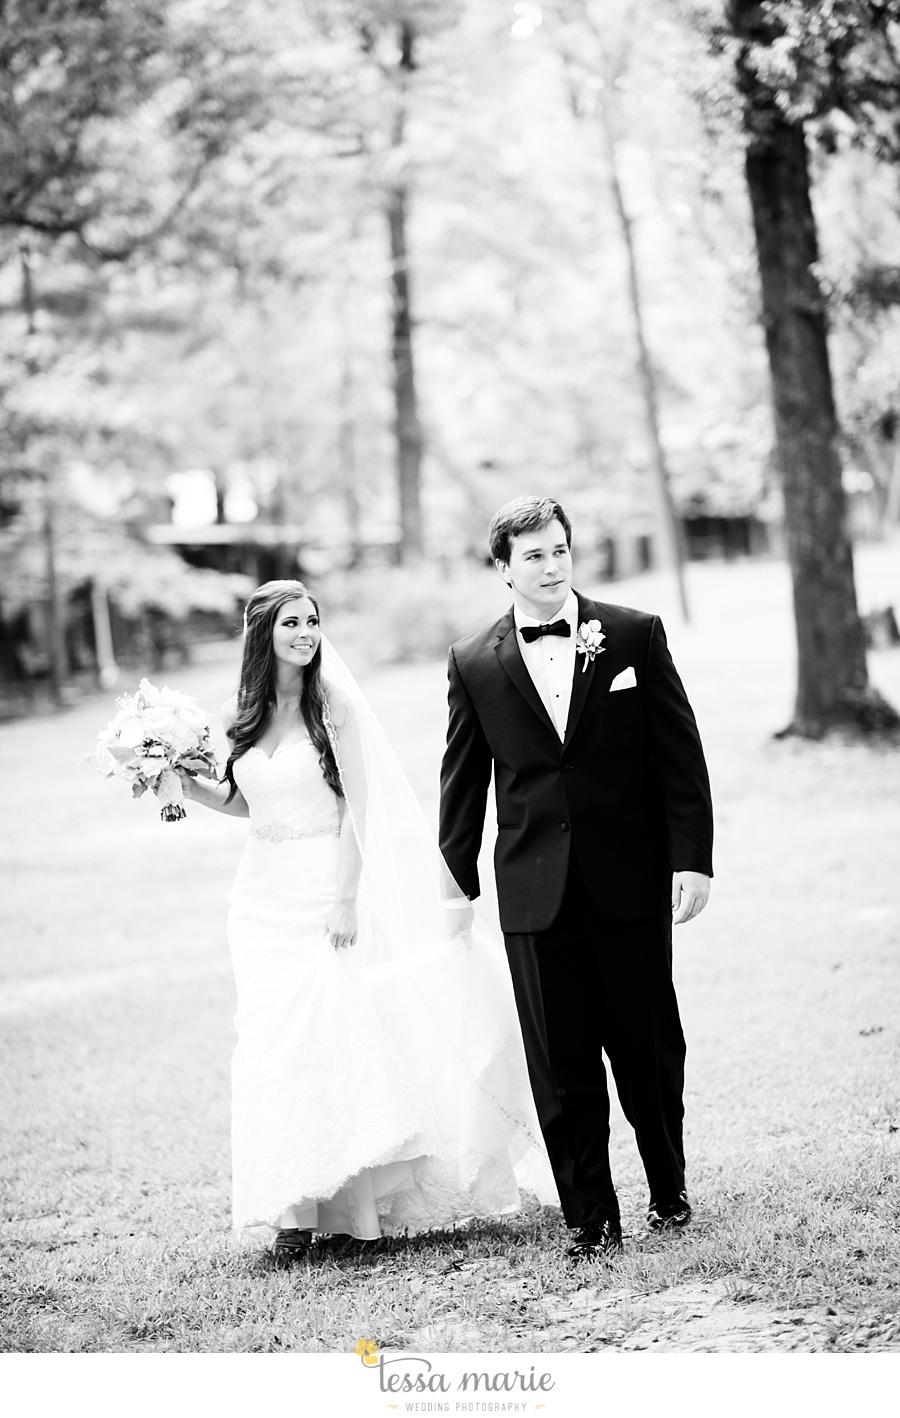 outdoor_wedding_pictures_marietta_sweethearts_candid_emotional_tessa_marie_weddings_0063